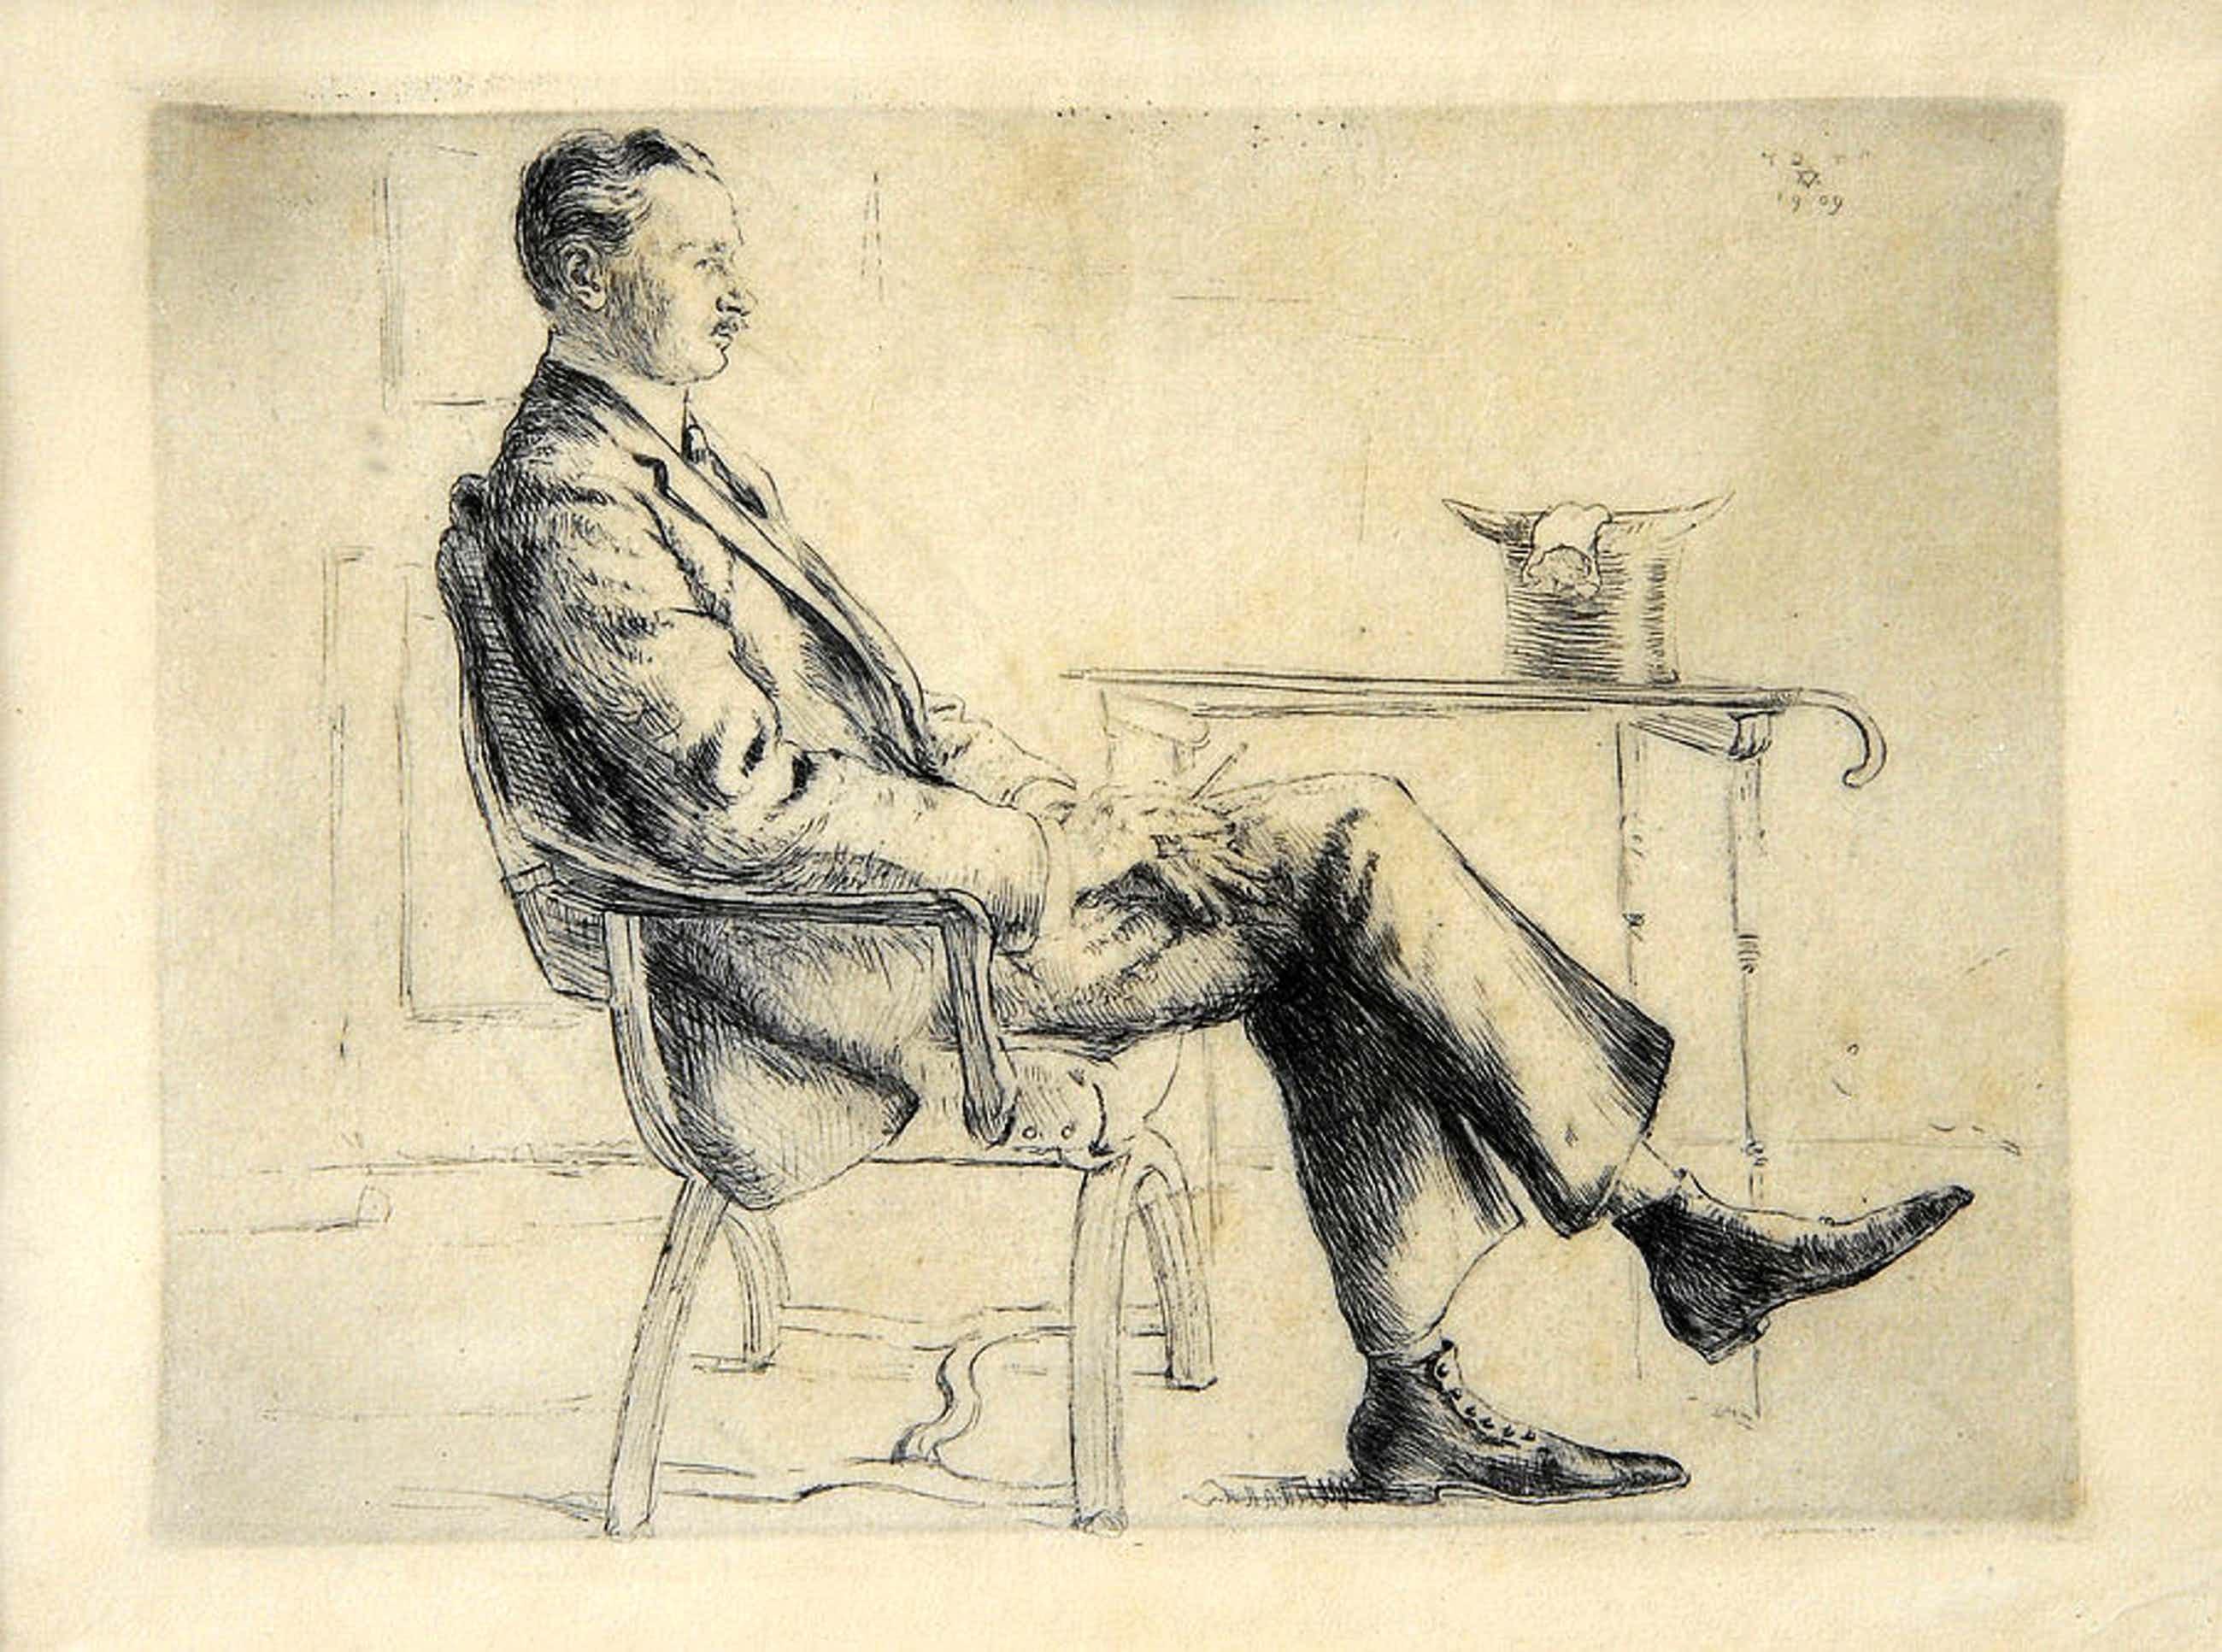 Hermann Struck - Bildnis des Schriftstellers Felix Poppenberg 1909 kopen? Bied vanaf 270!